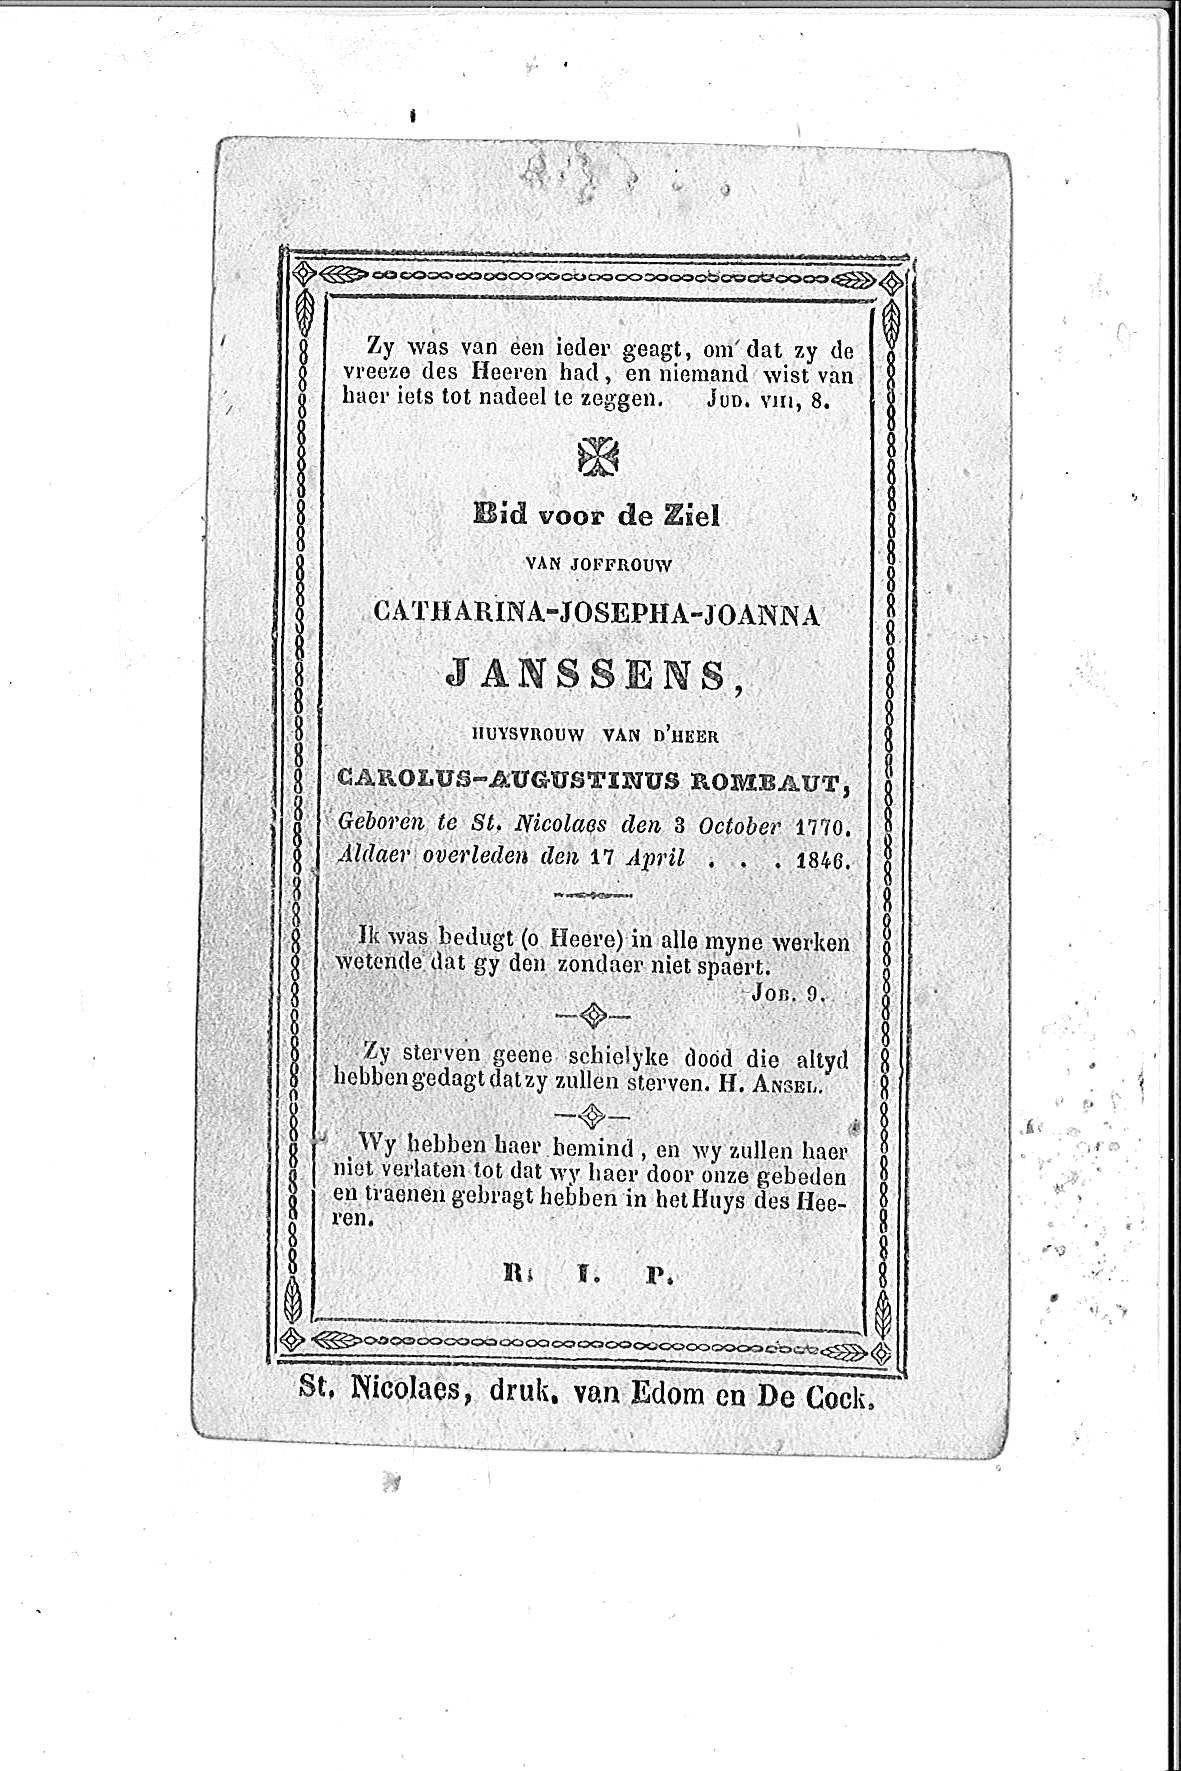 Catharina-josepha-Joanna(1846).jpg